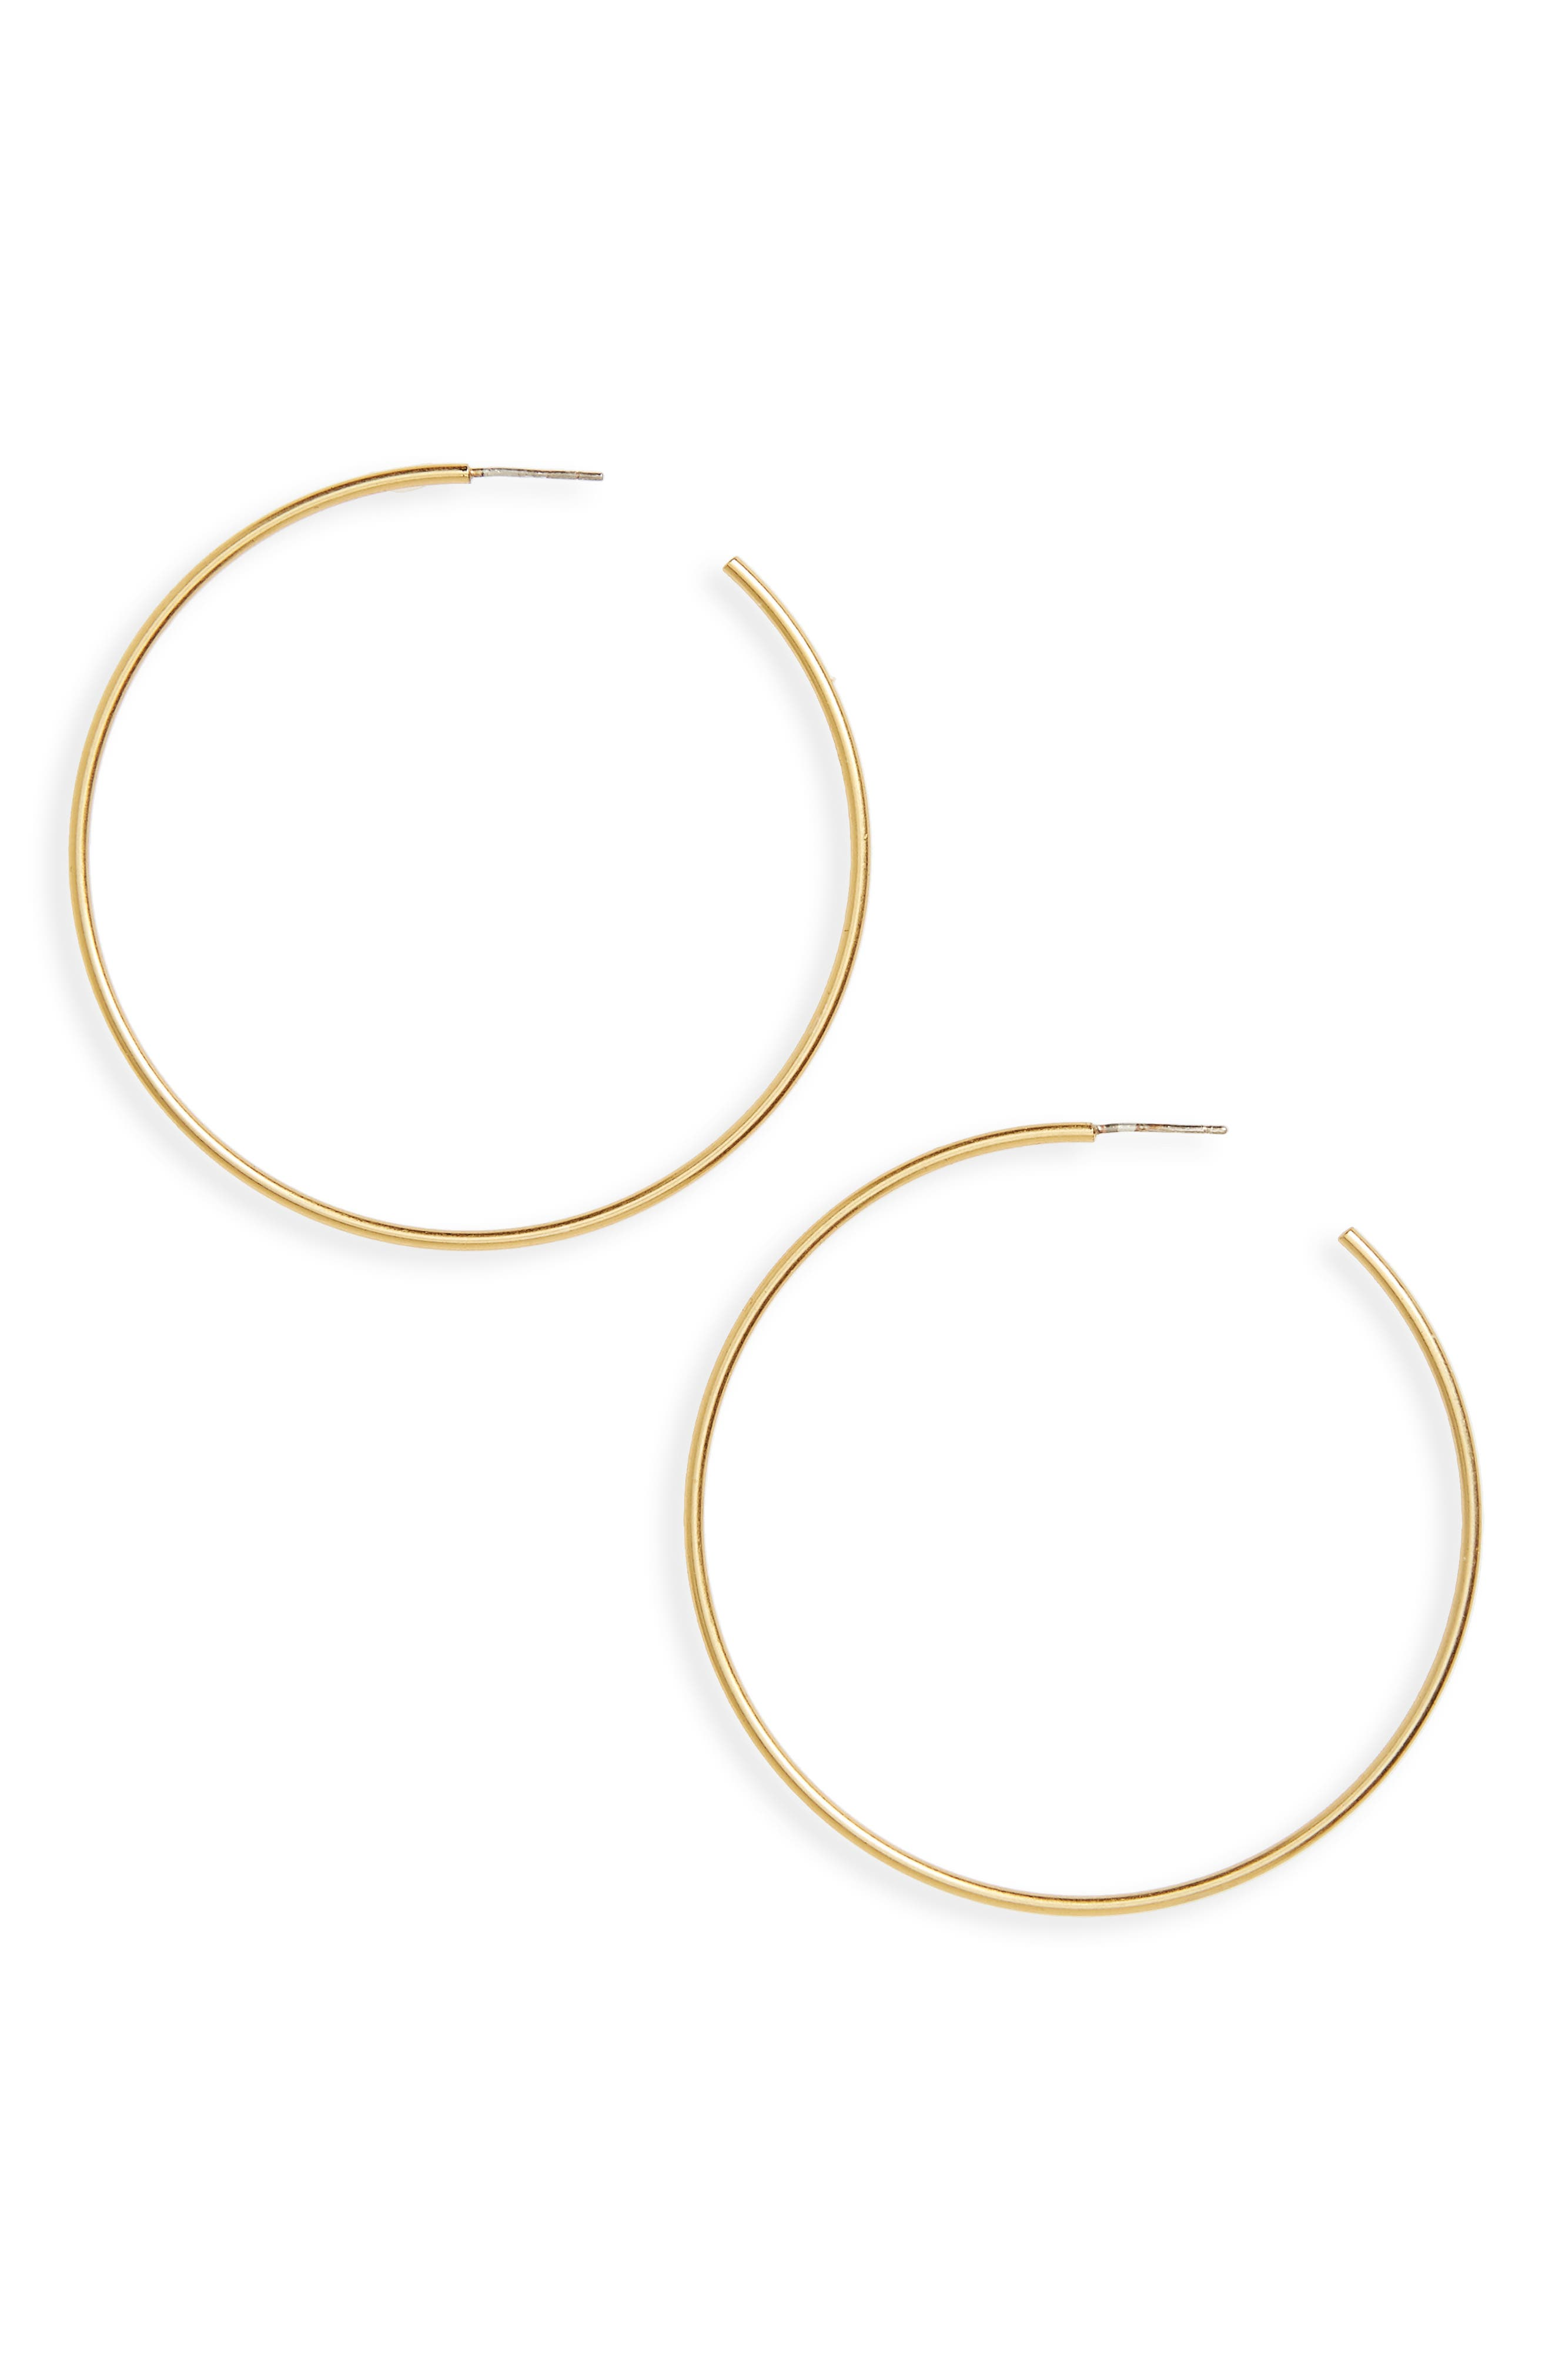 Hoop Earrings,                             Main thumbnail 1, color,                             Vintage Gold